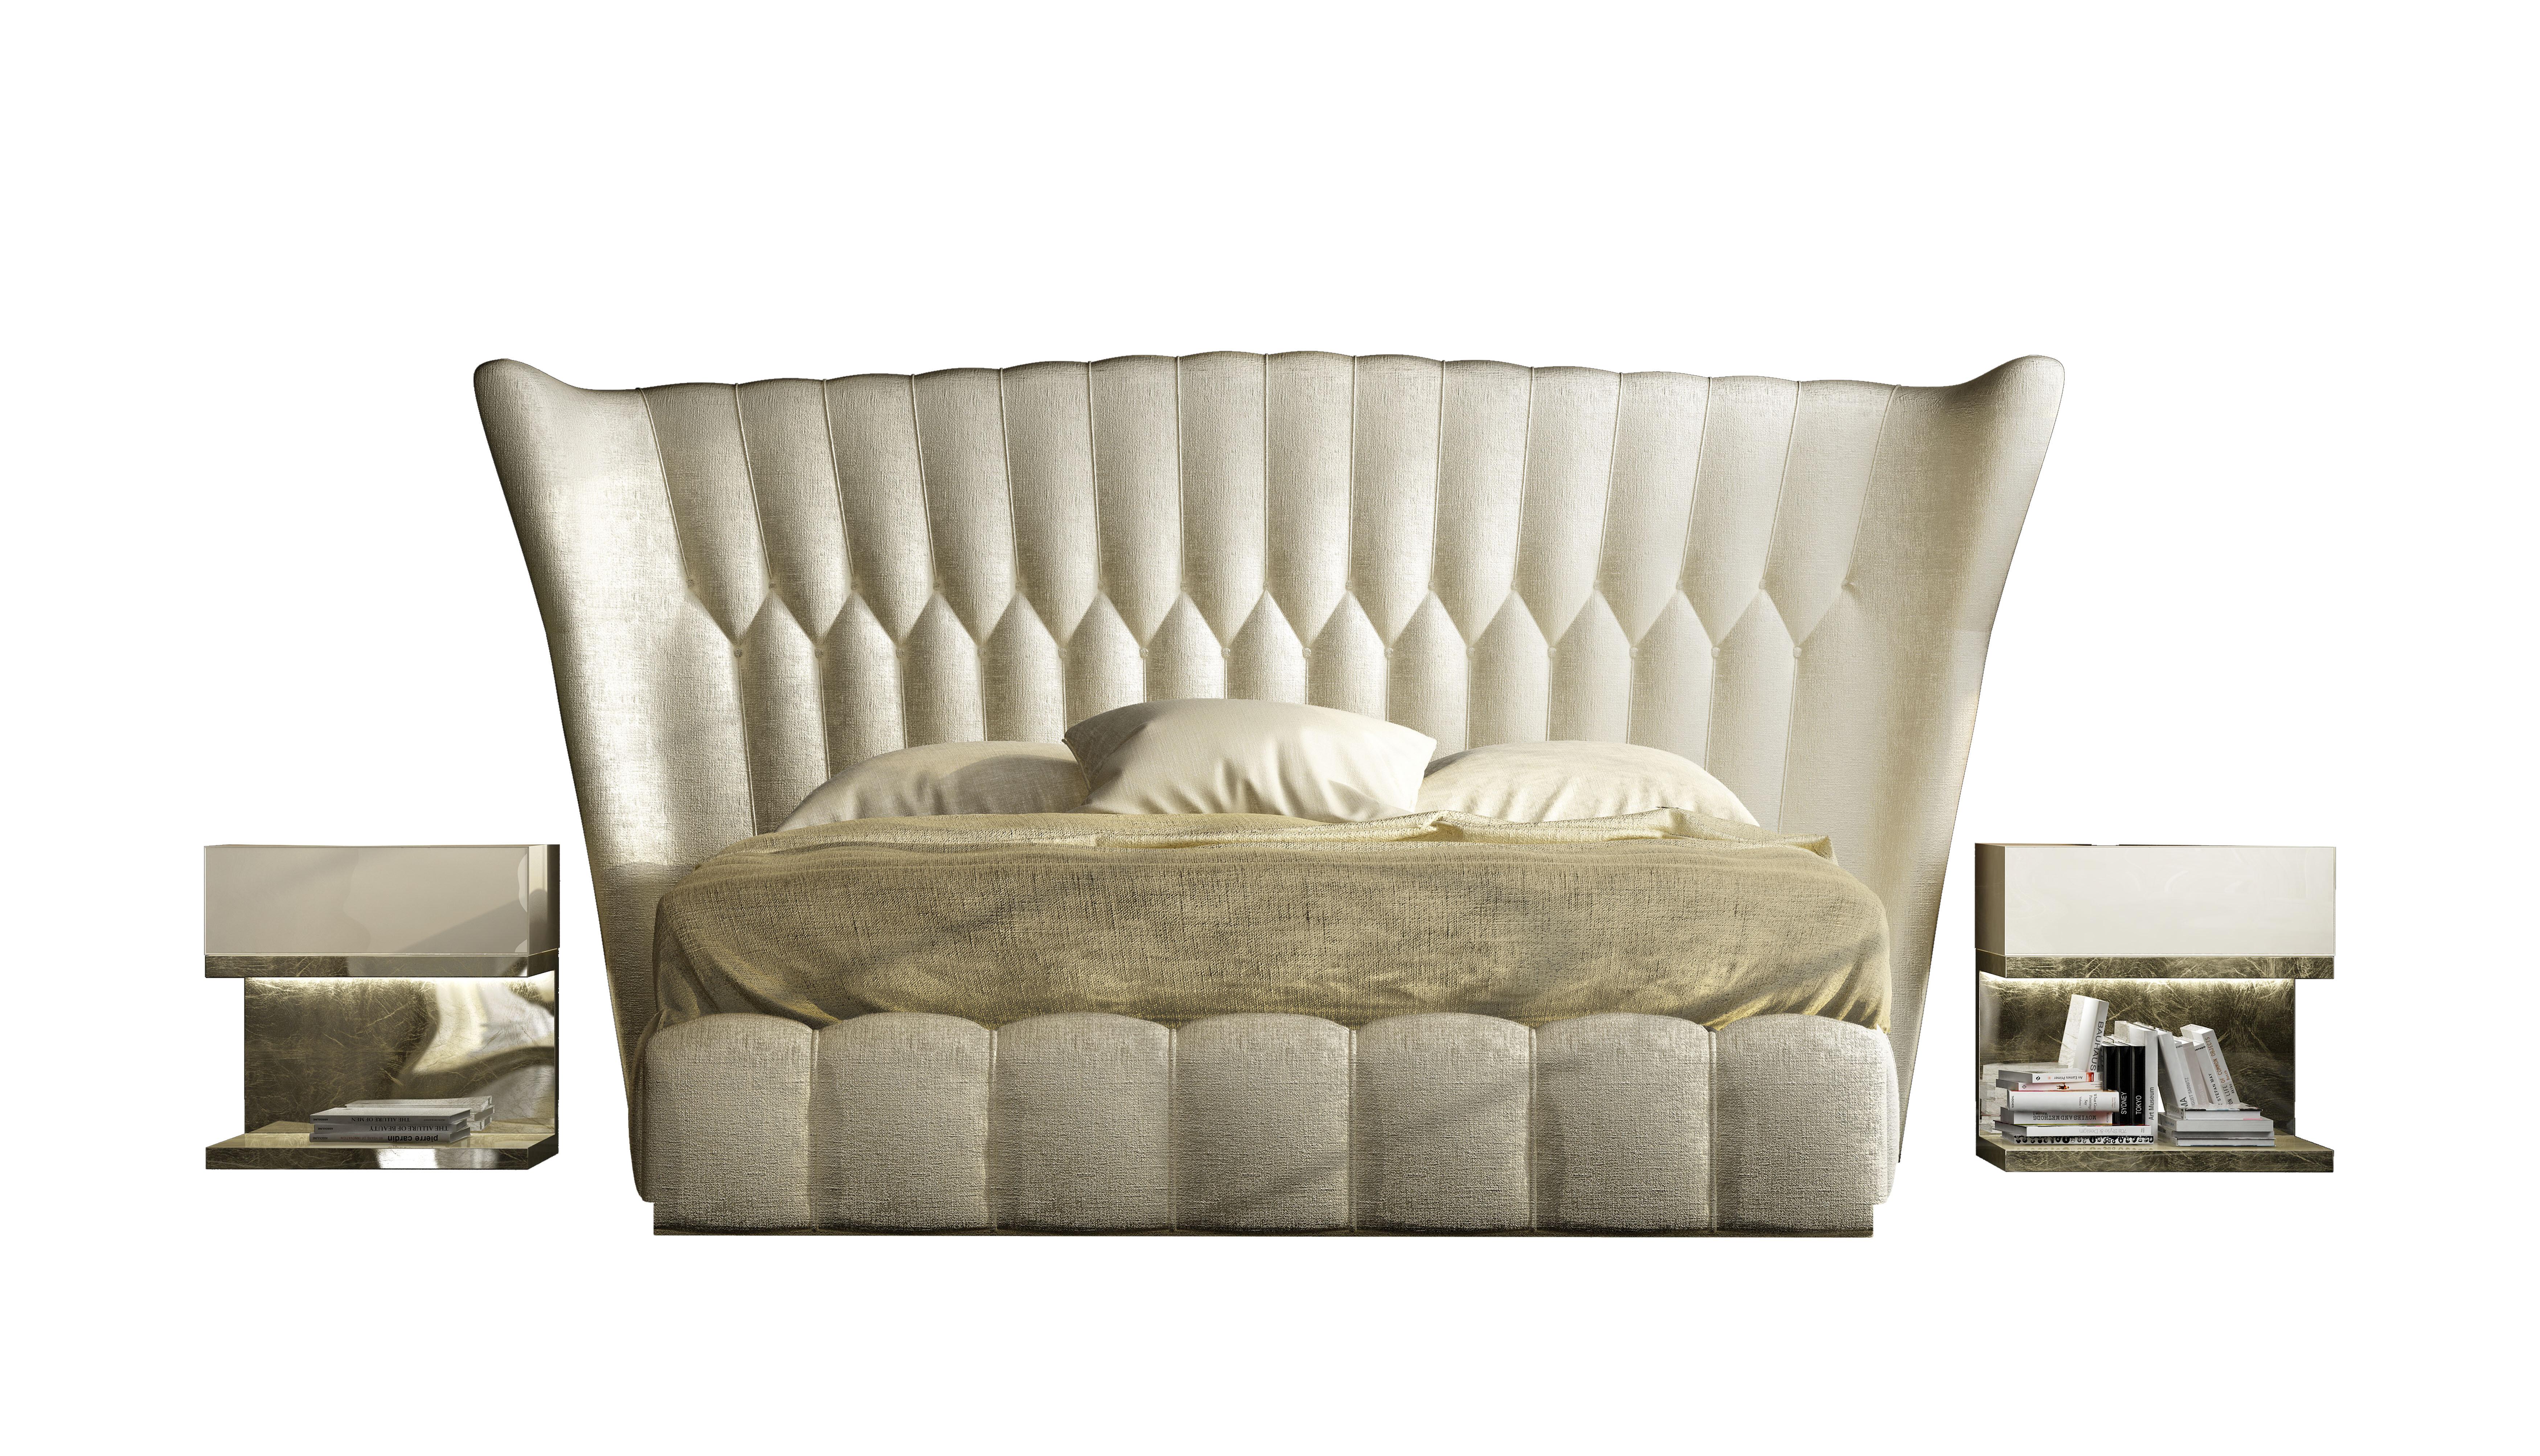 Hispania Home London Bedor43 Bedroom Set 3 Pieces Wayfair